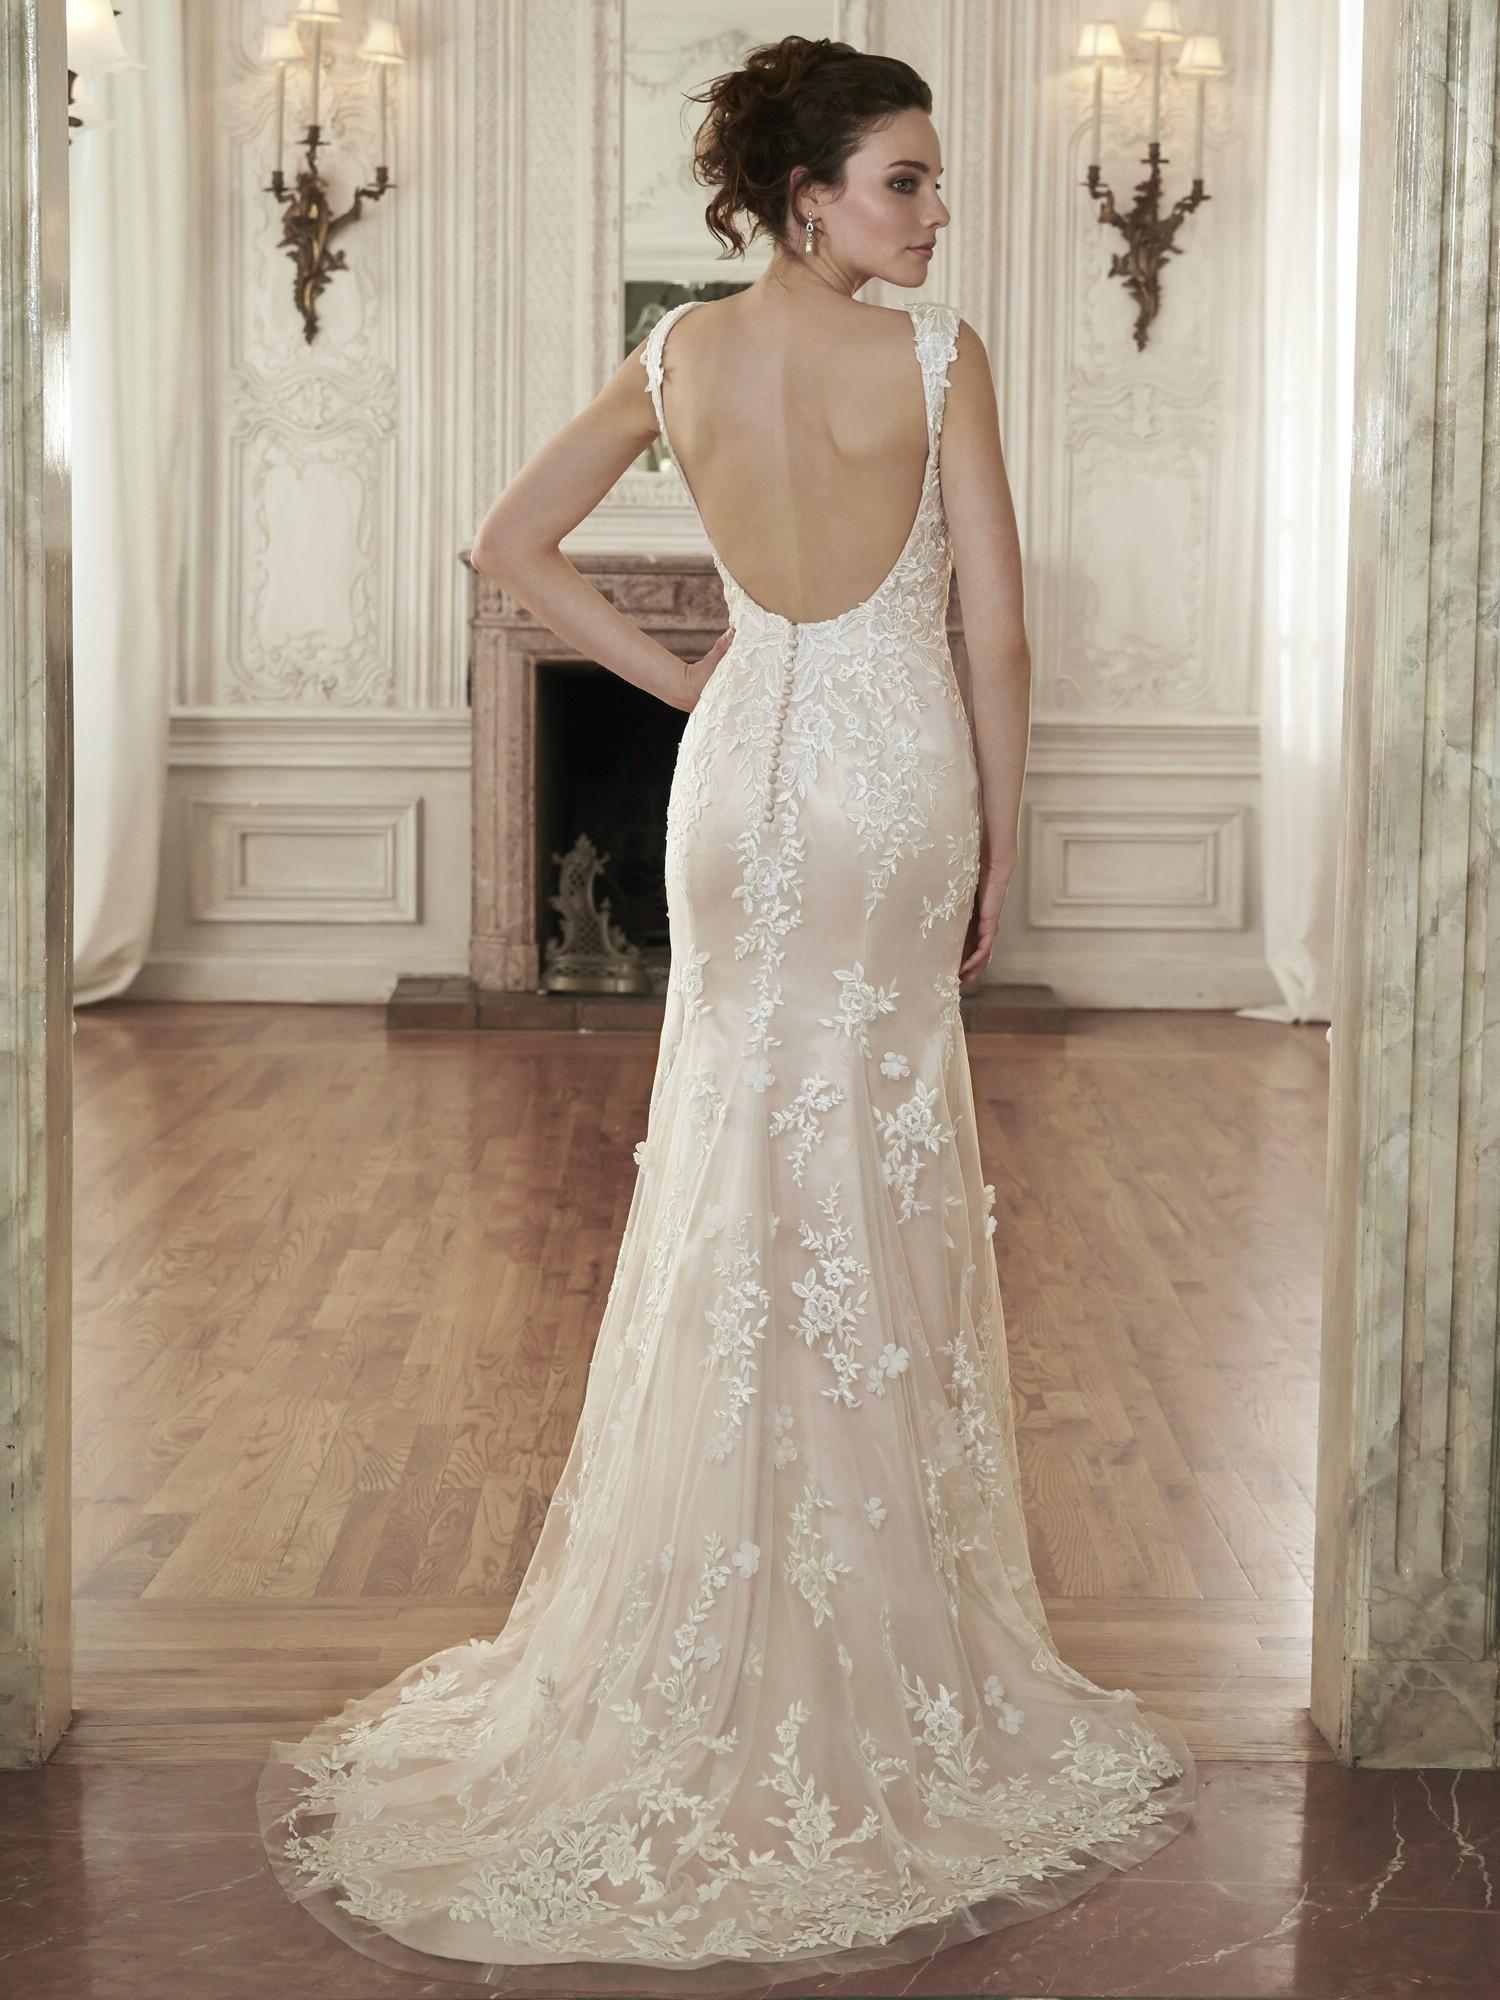 lace wedding dresses open back photo - 1